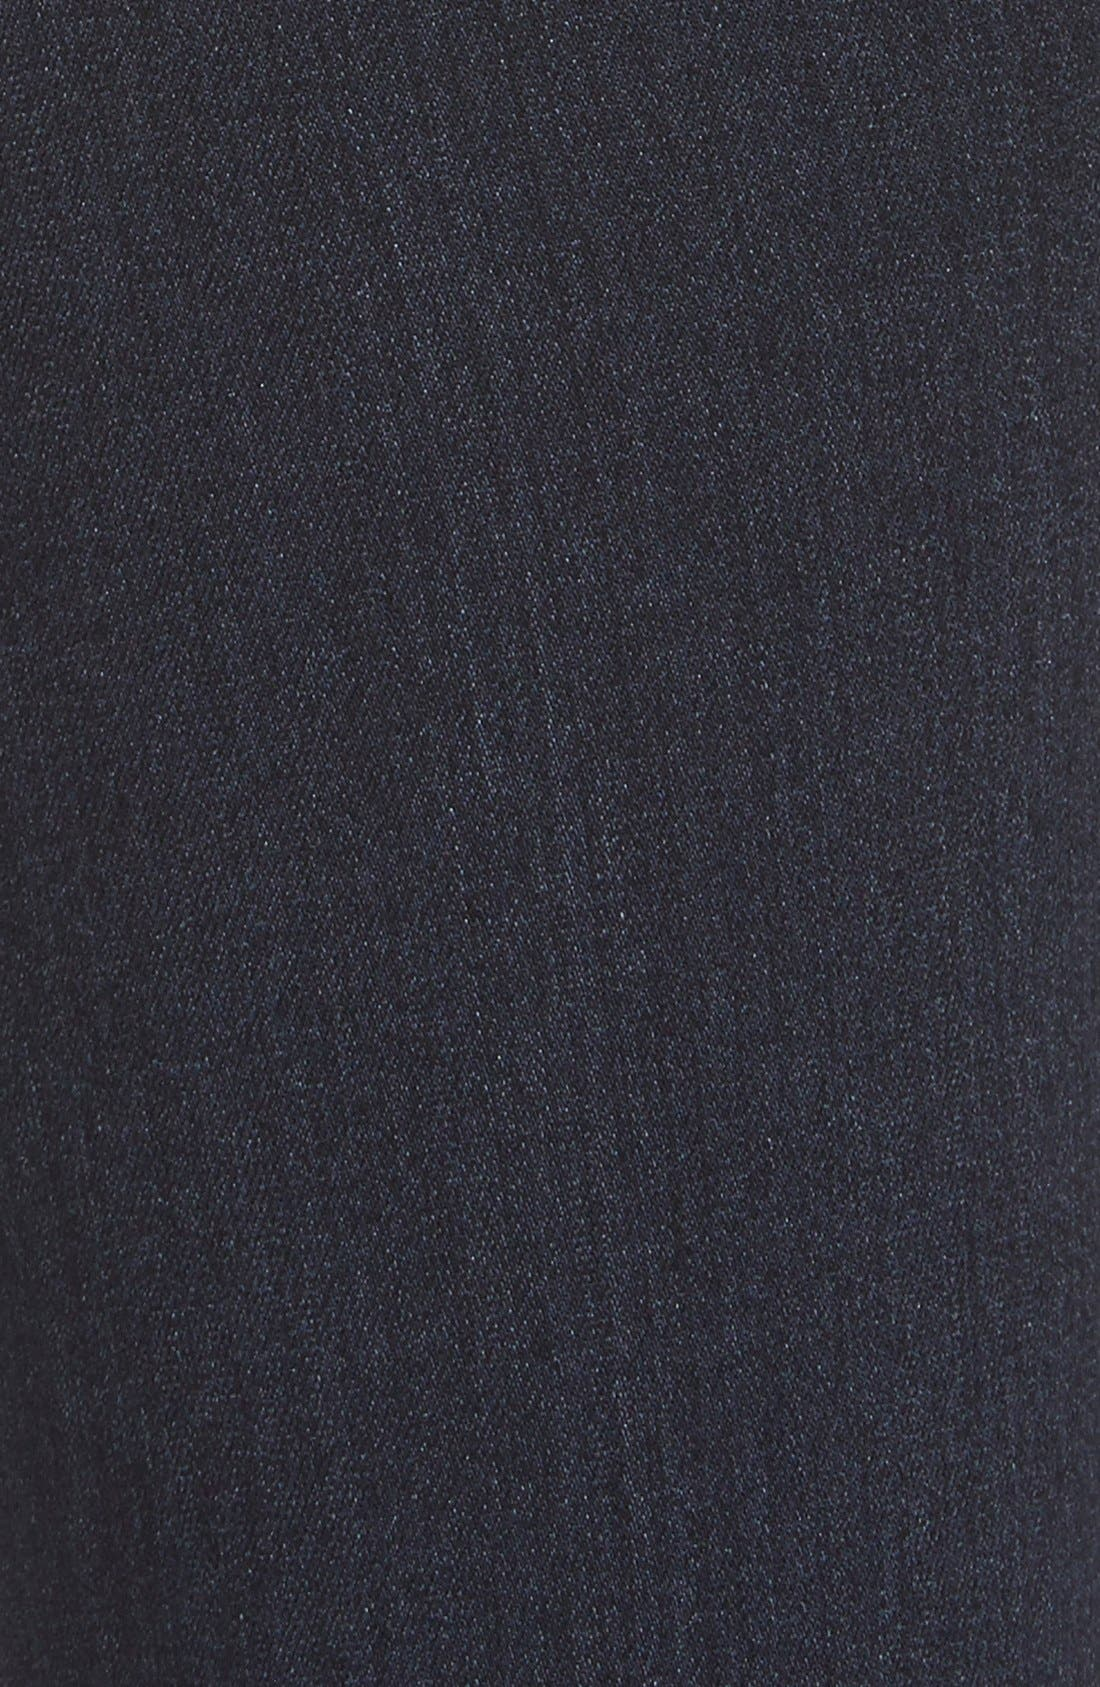 Denim 'Transcend - Hoxton' High Rise Ankle Skinny Jeans,                             Alternate thumbnail 5, color,                             400